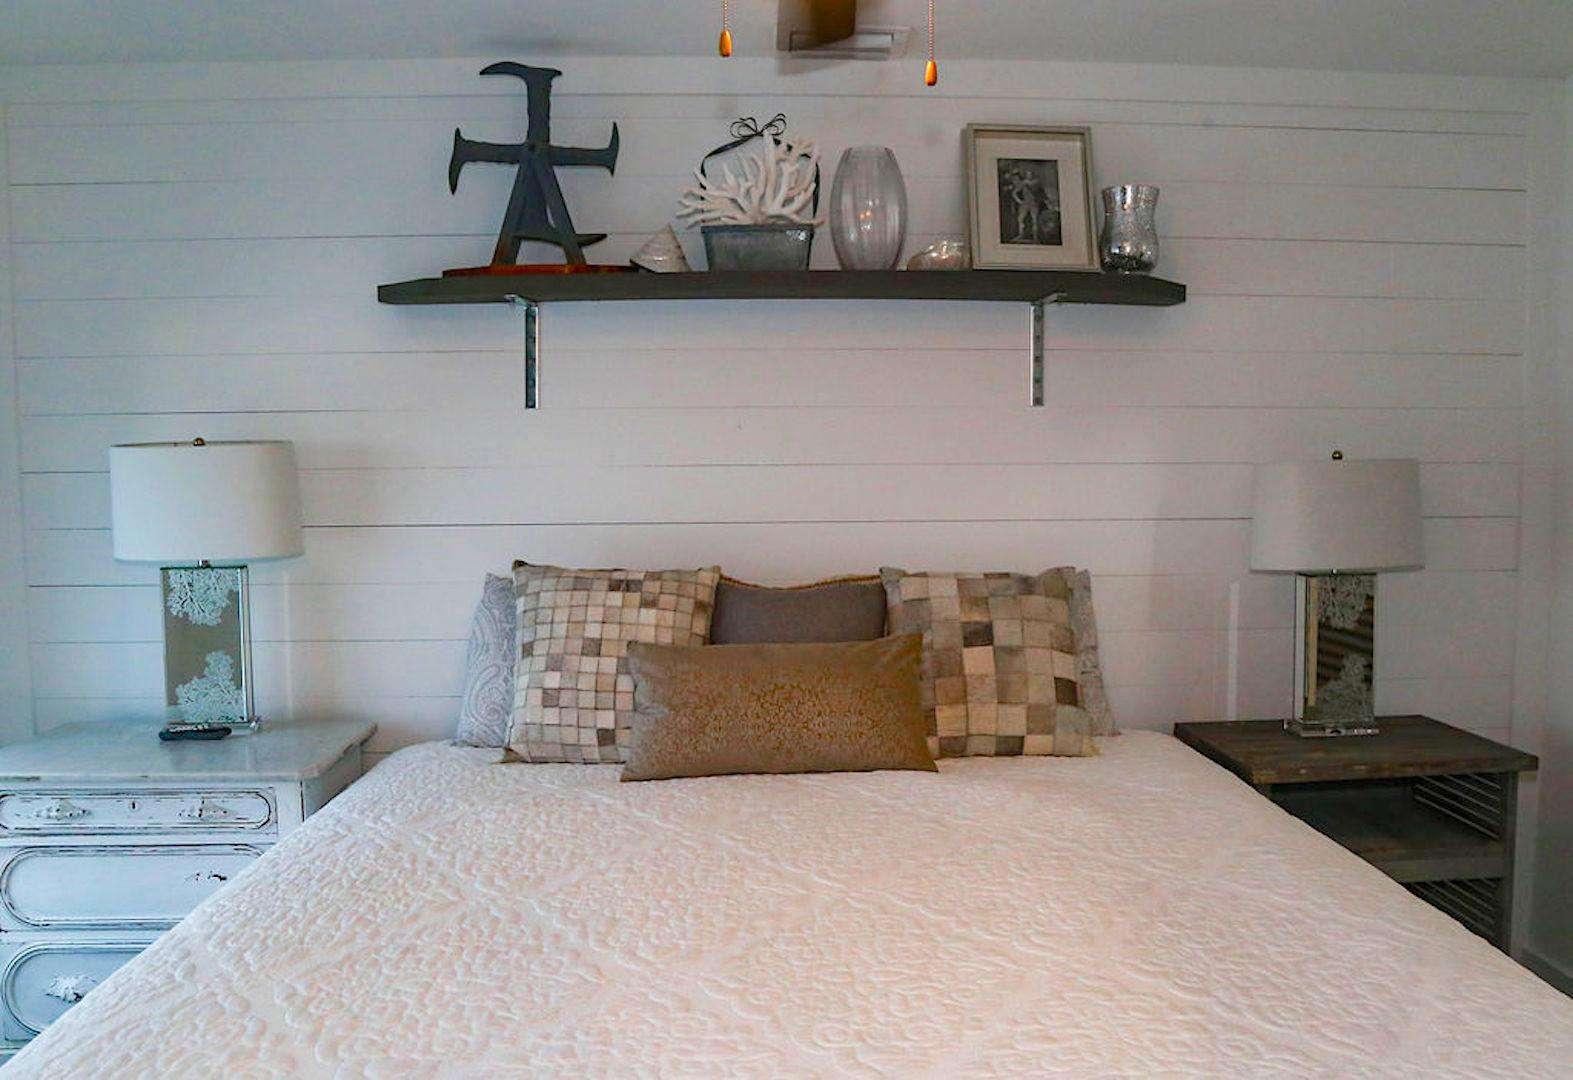 BR # 1 has king bed/bath/flat screen